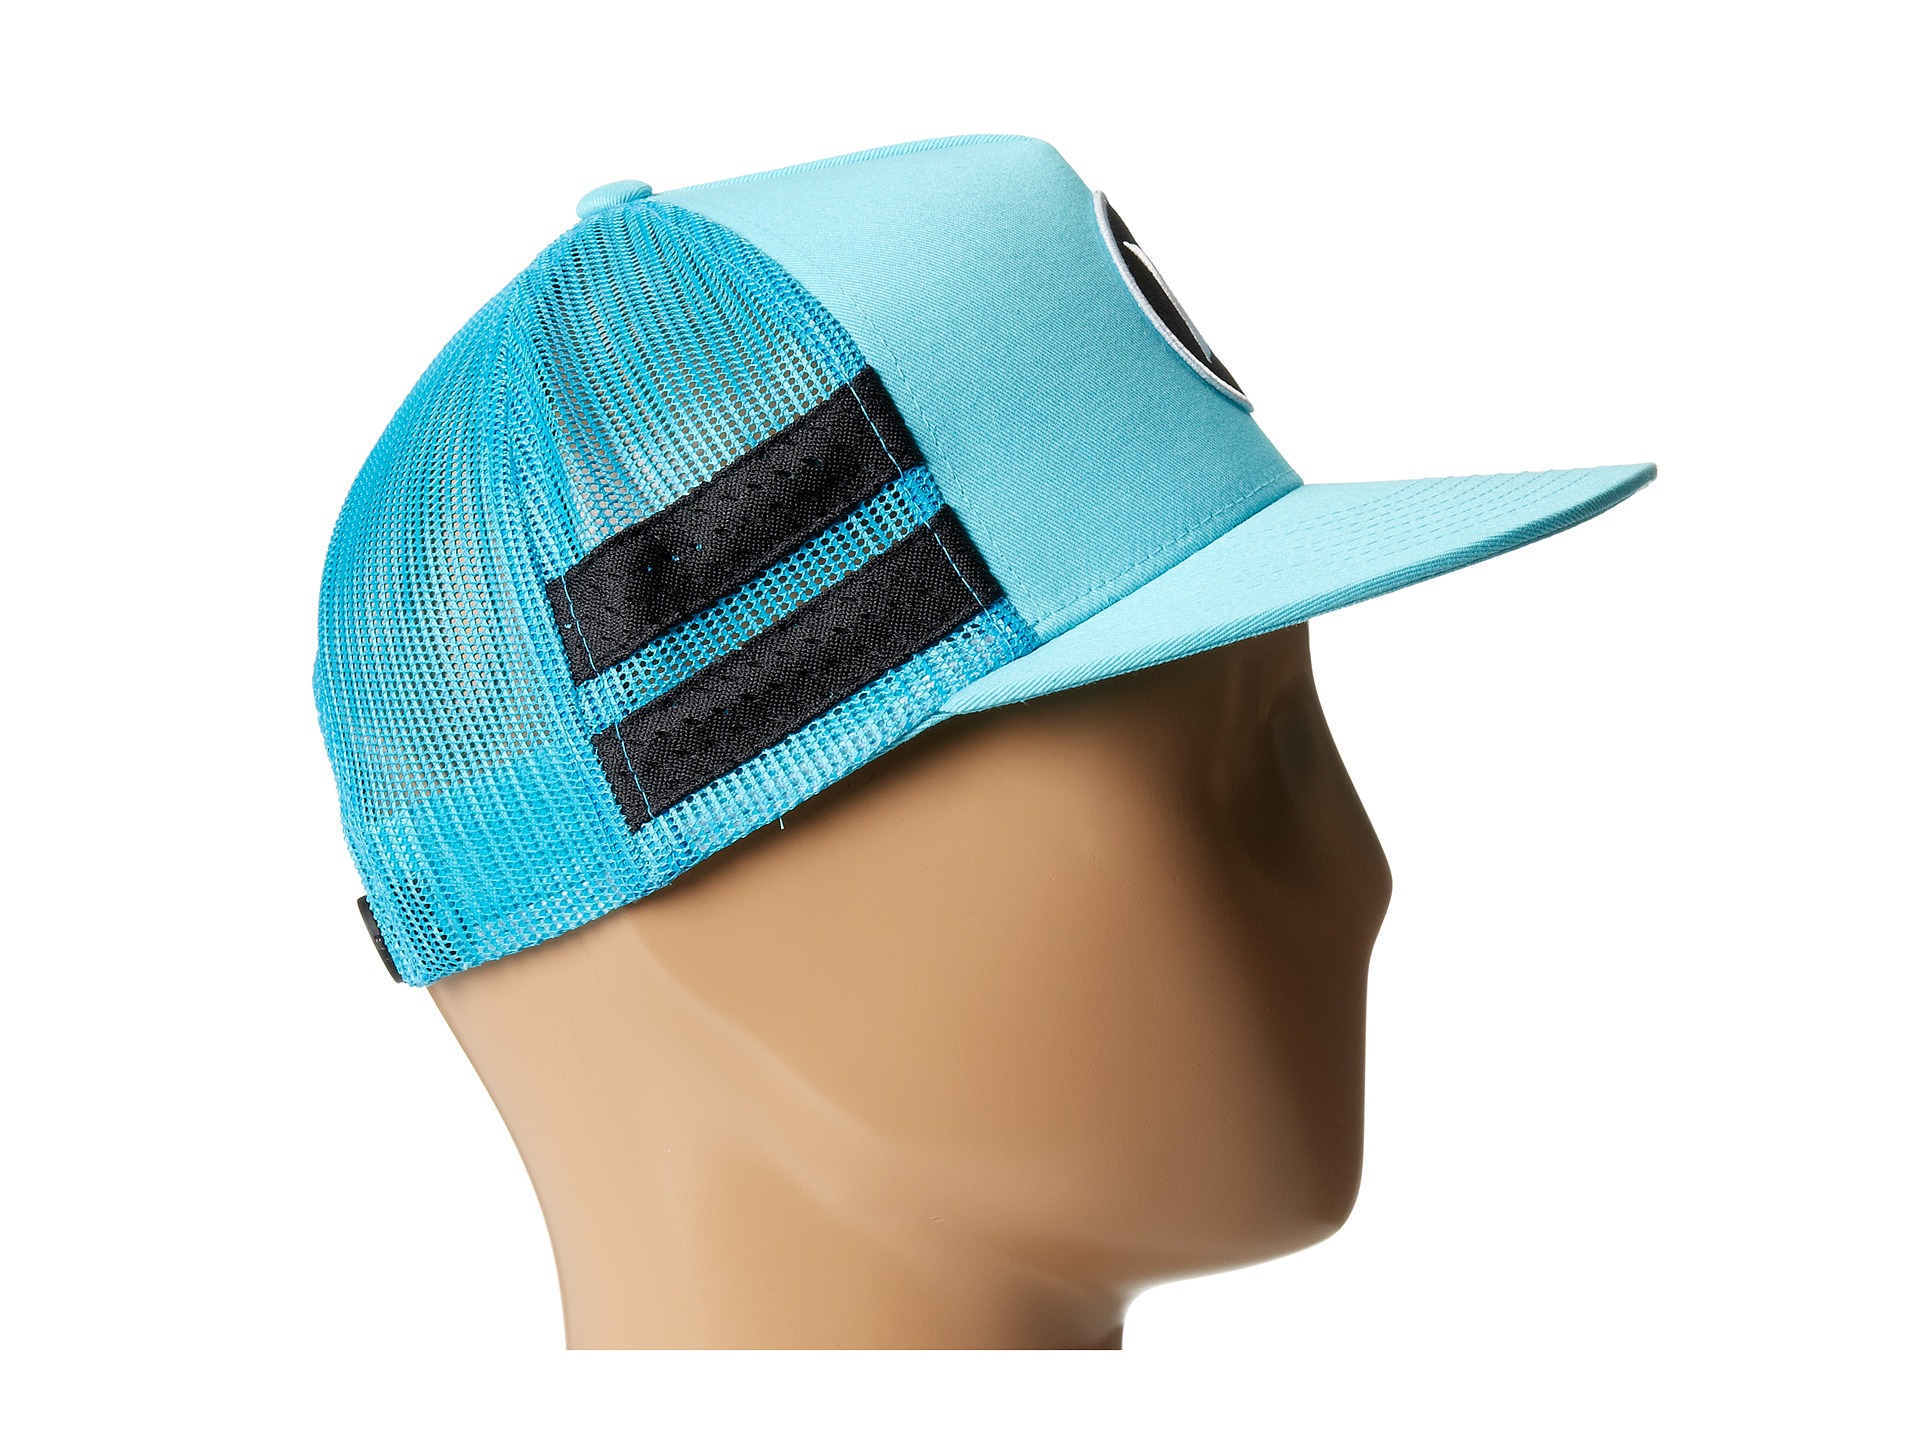 half off 11cae 18641 ... greece lyst hurley block party movement trucker hat in blue for men  b390d 86930